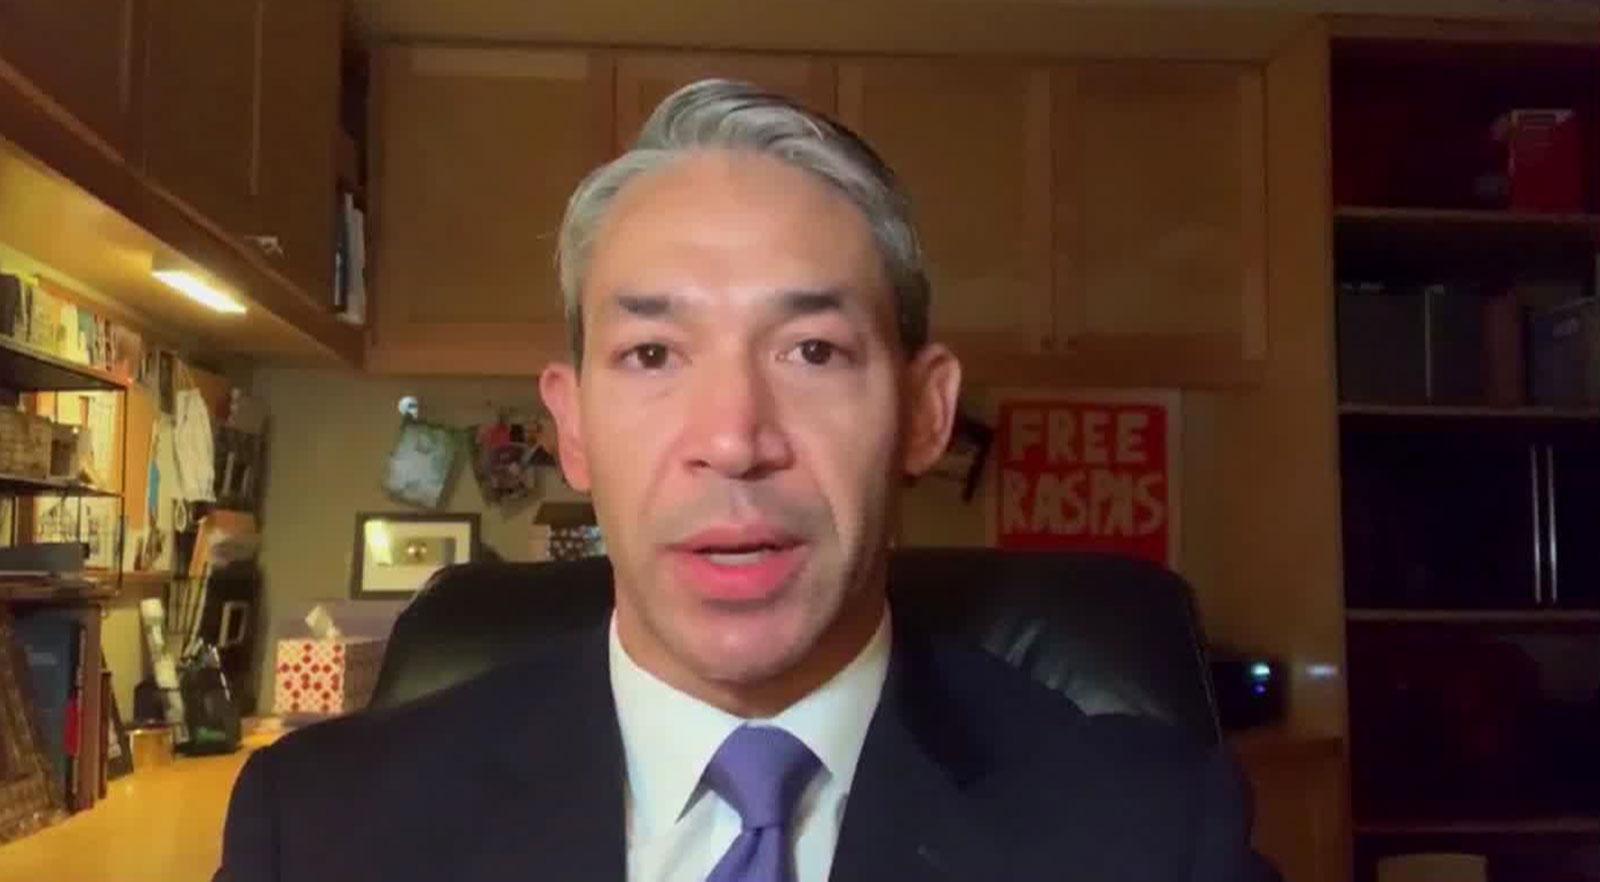 San Antonio Mayor Ron Nirenberg speaks with CNN's John Berman on July 10.